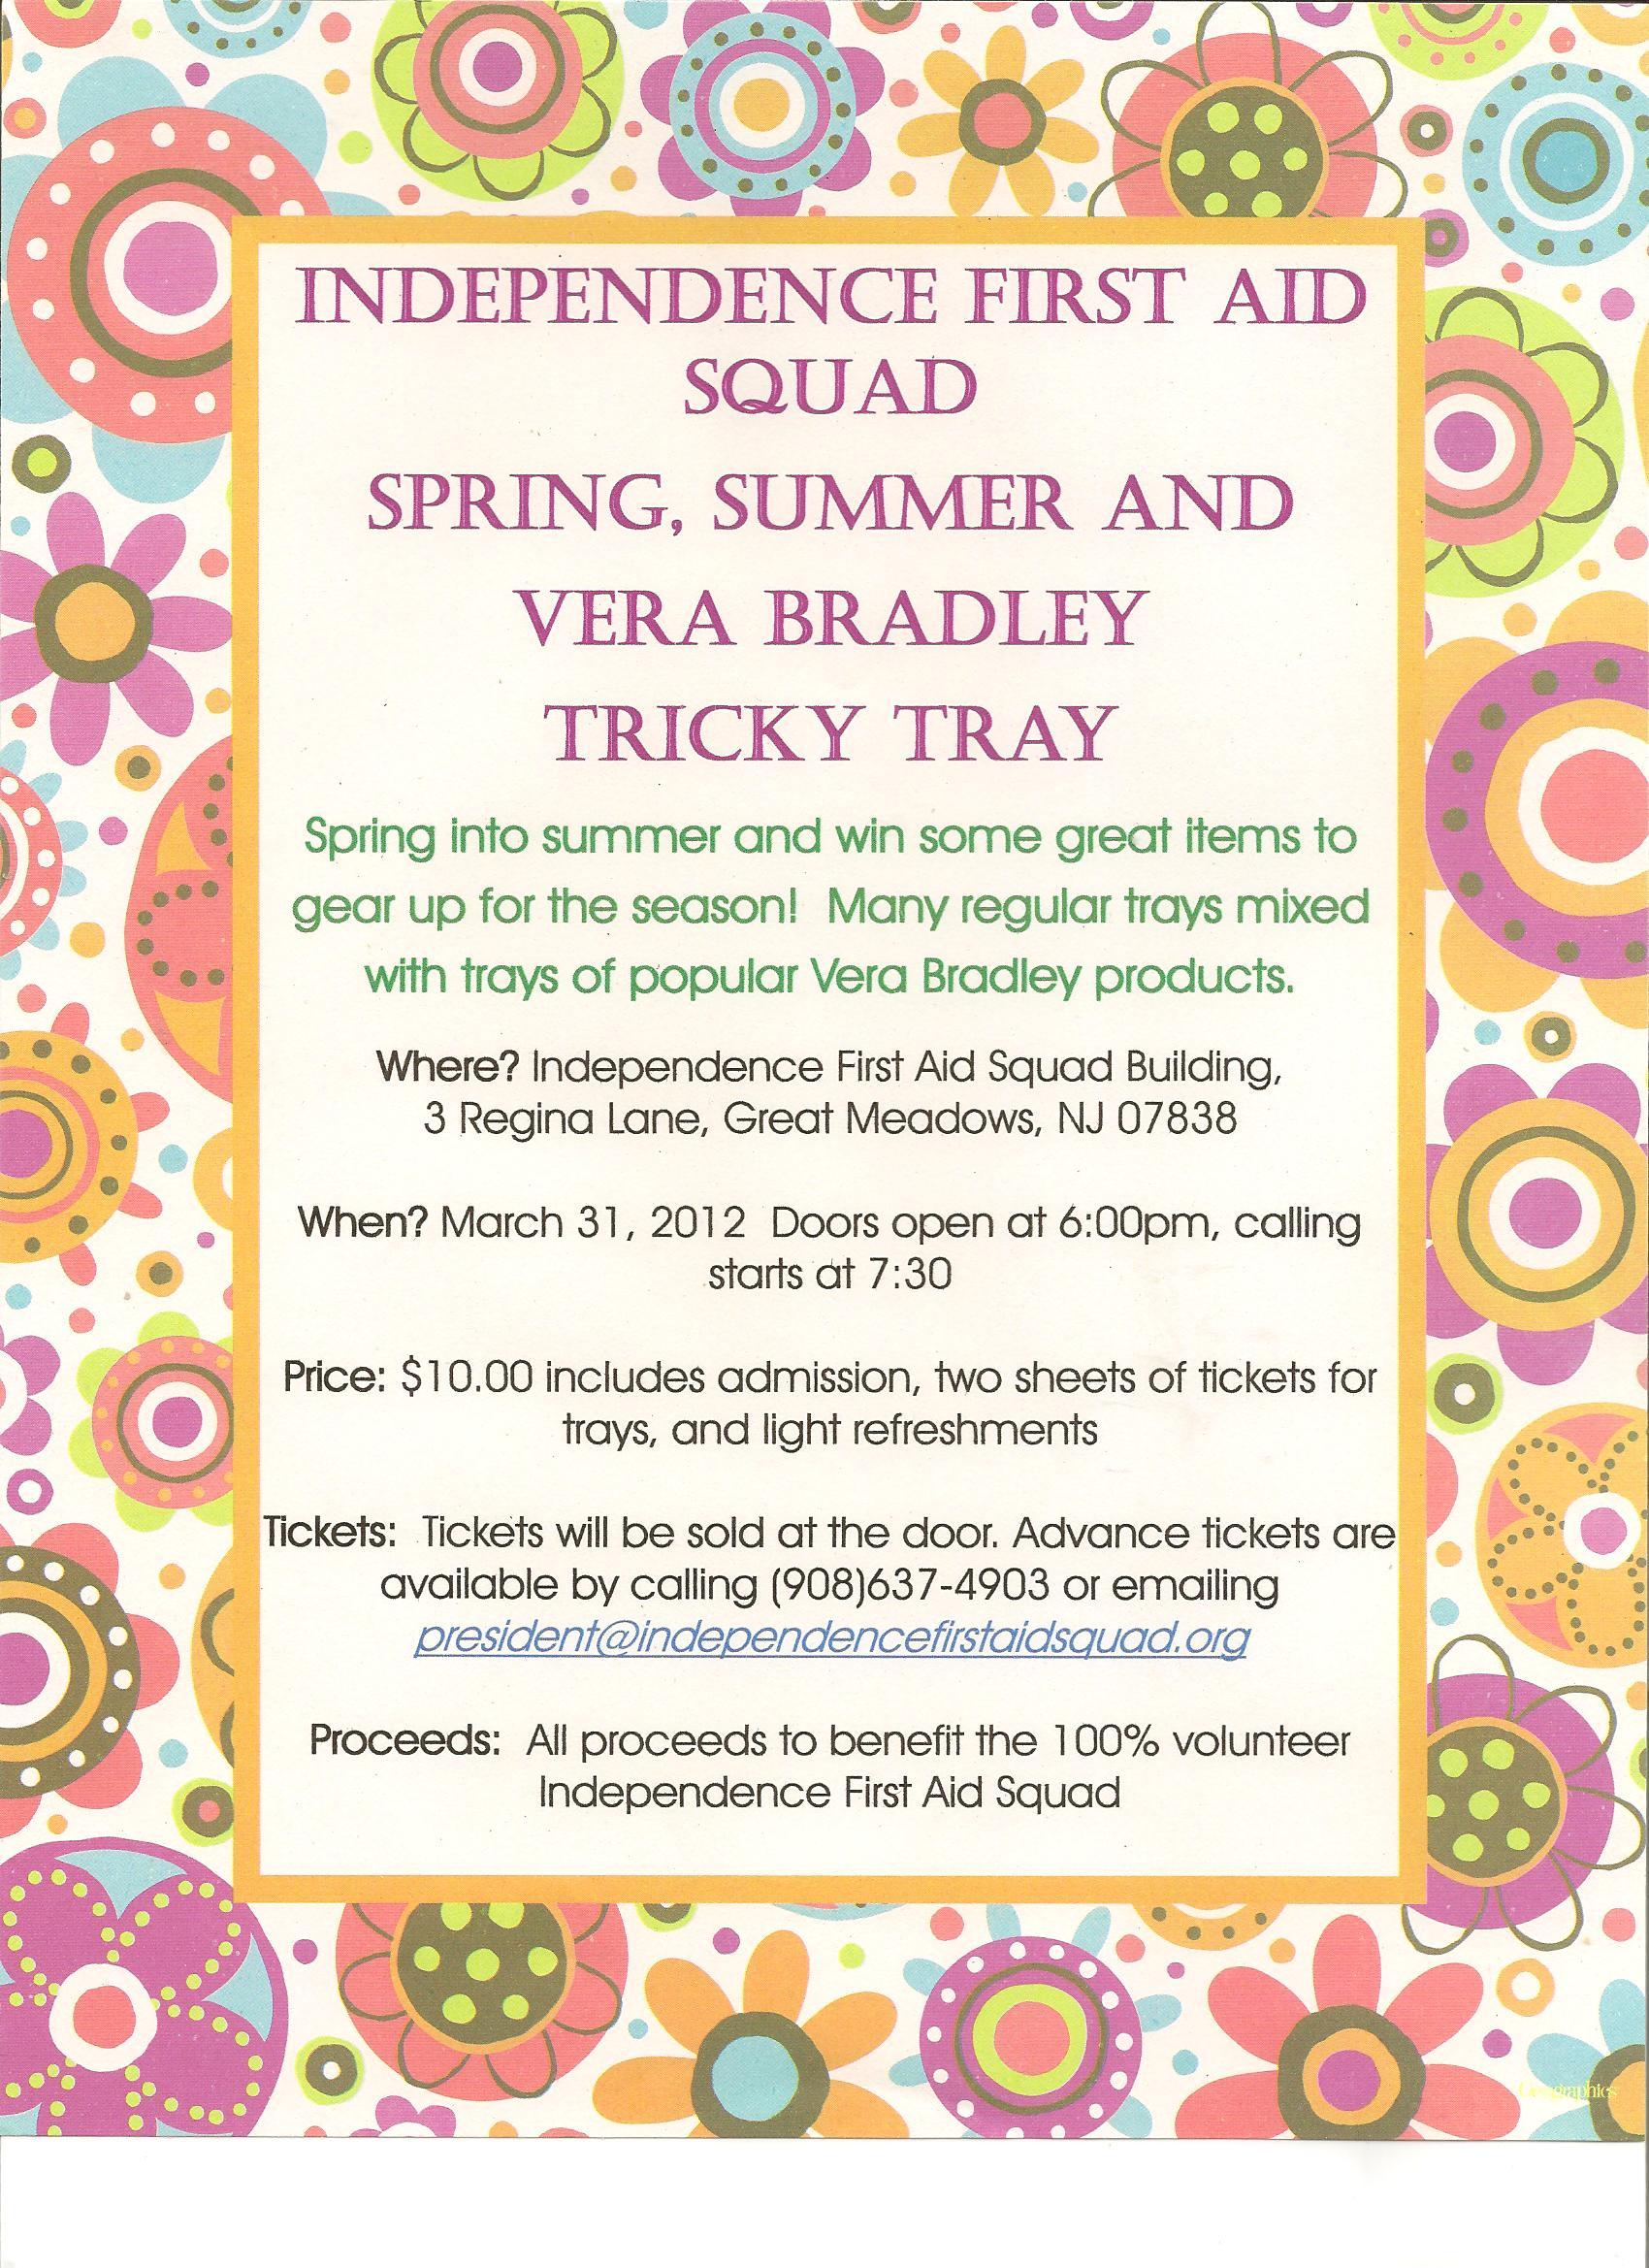 Liberty Township Nj Spring Summer And Vera Bradley